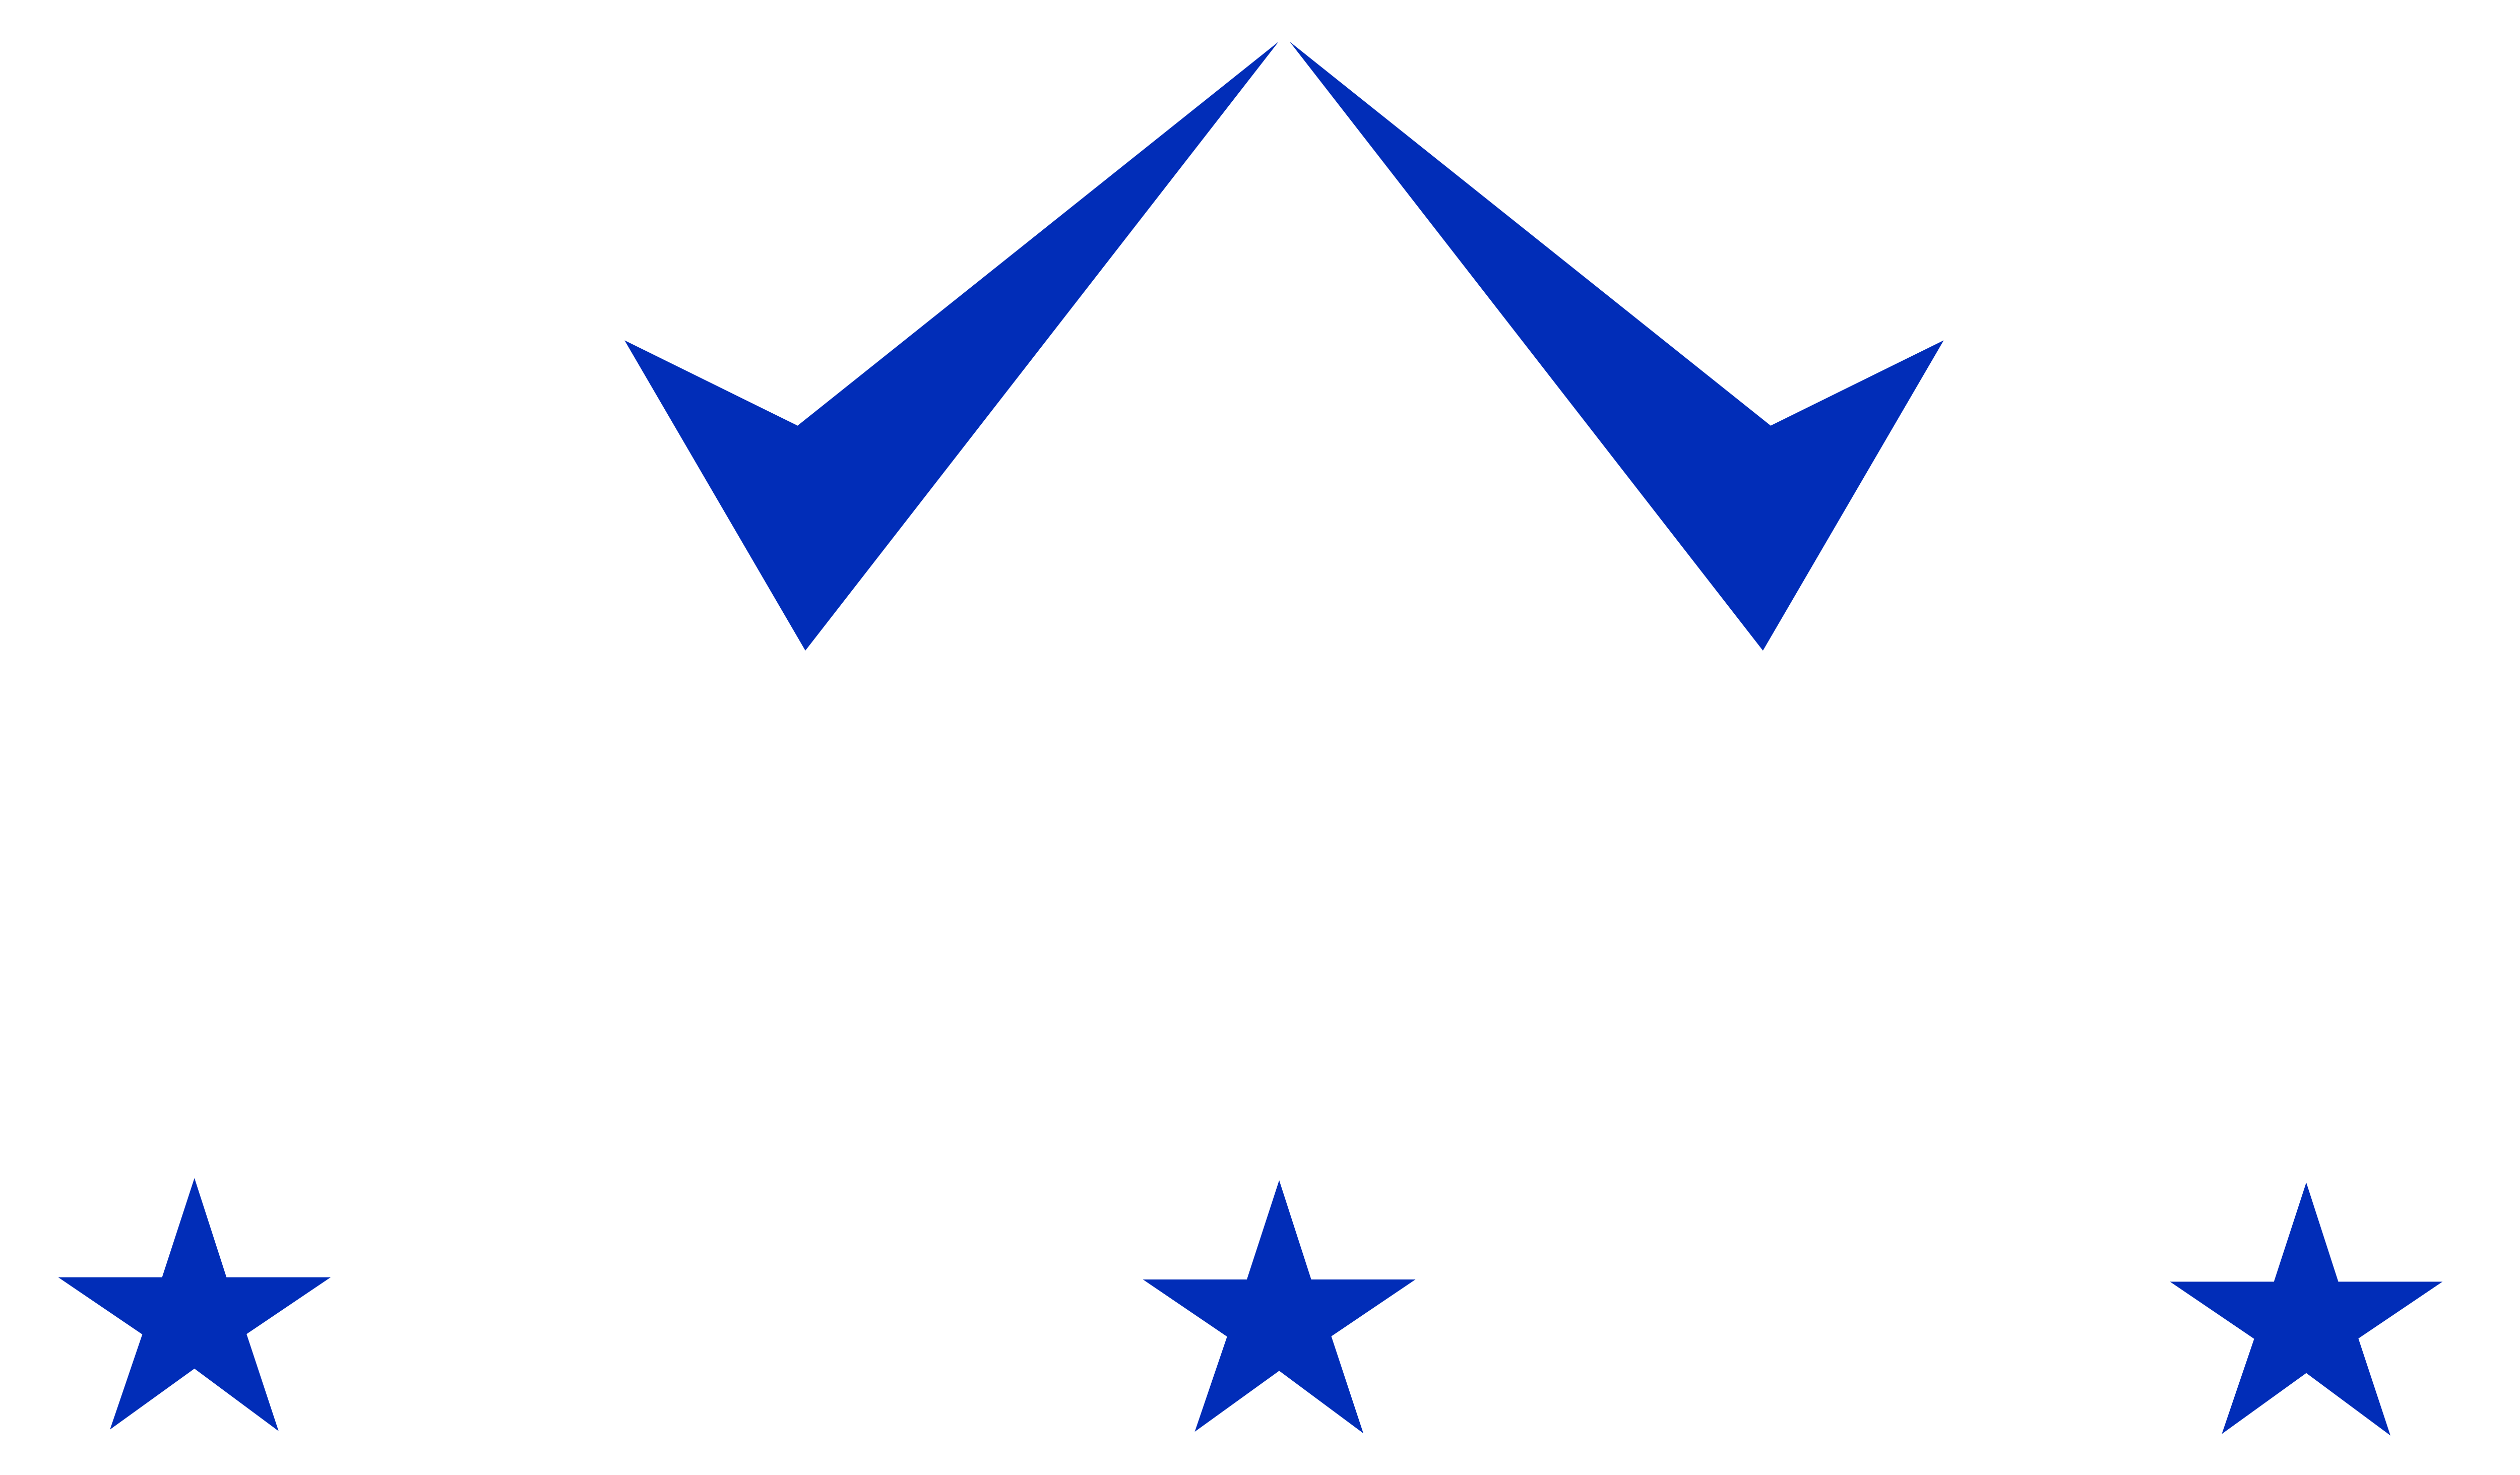 Beveiligings Service Texel